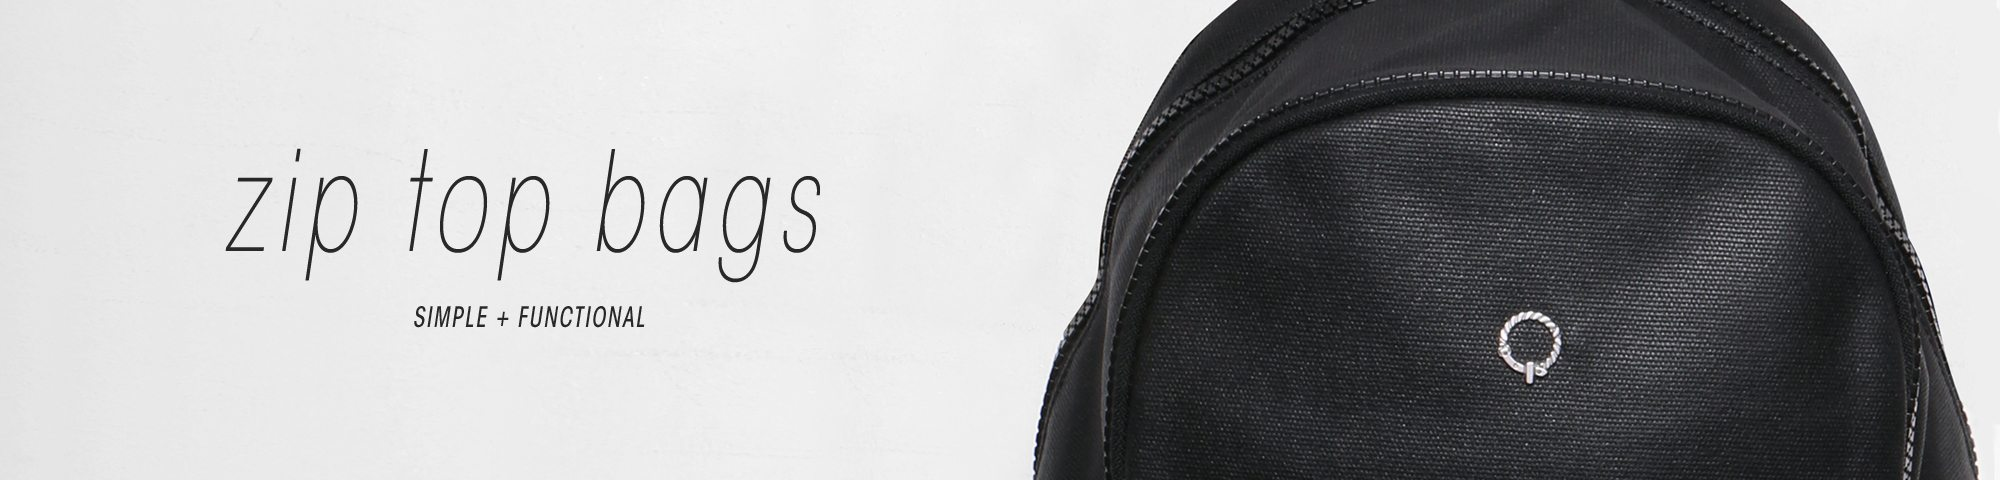 Zip Top Backpacks